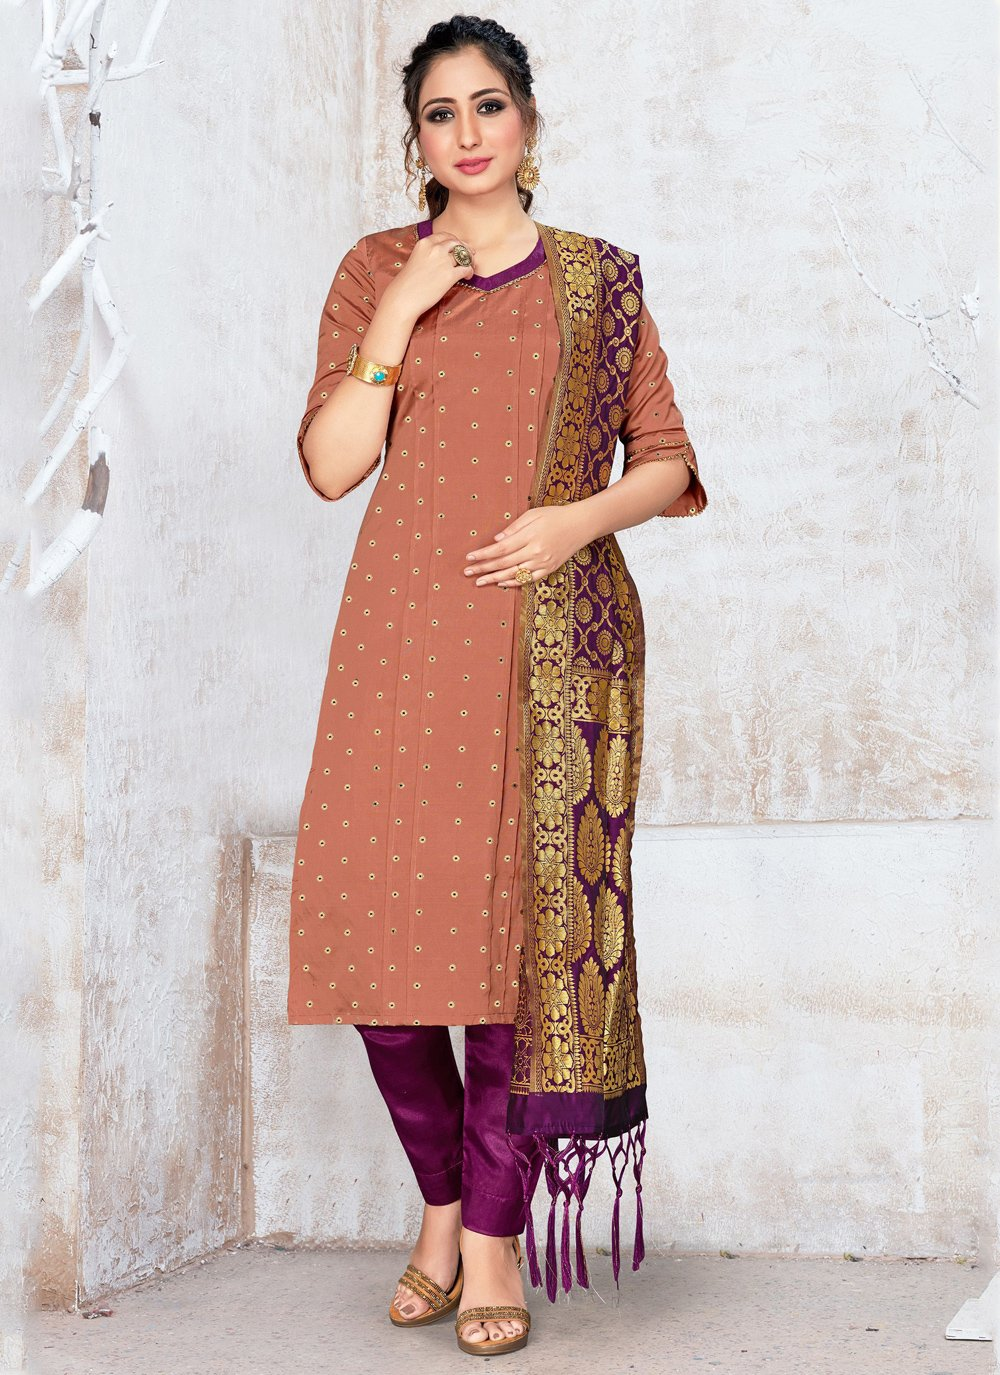 Banarasi Silk Salwar Kameez in Brown